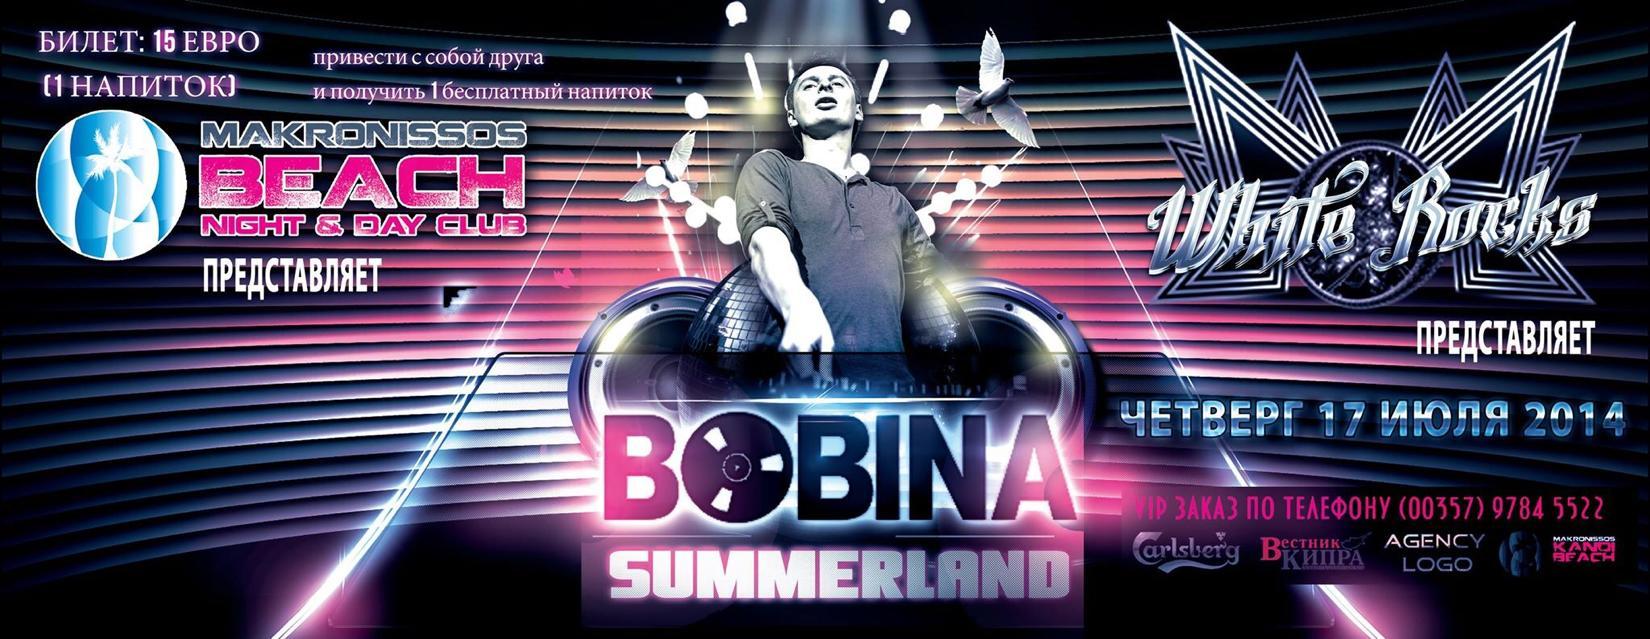 Bobina July 17th Ayia Napa